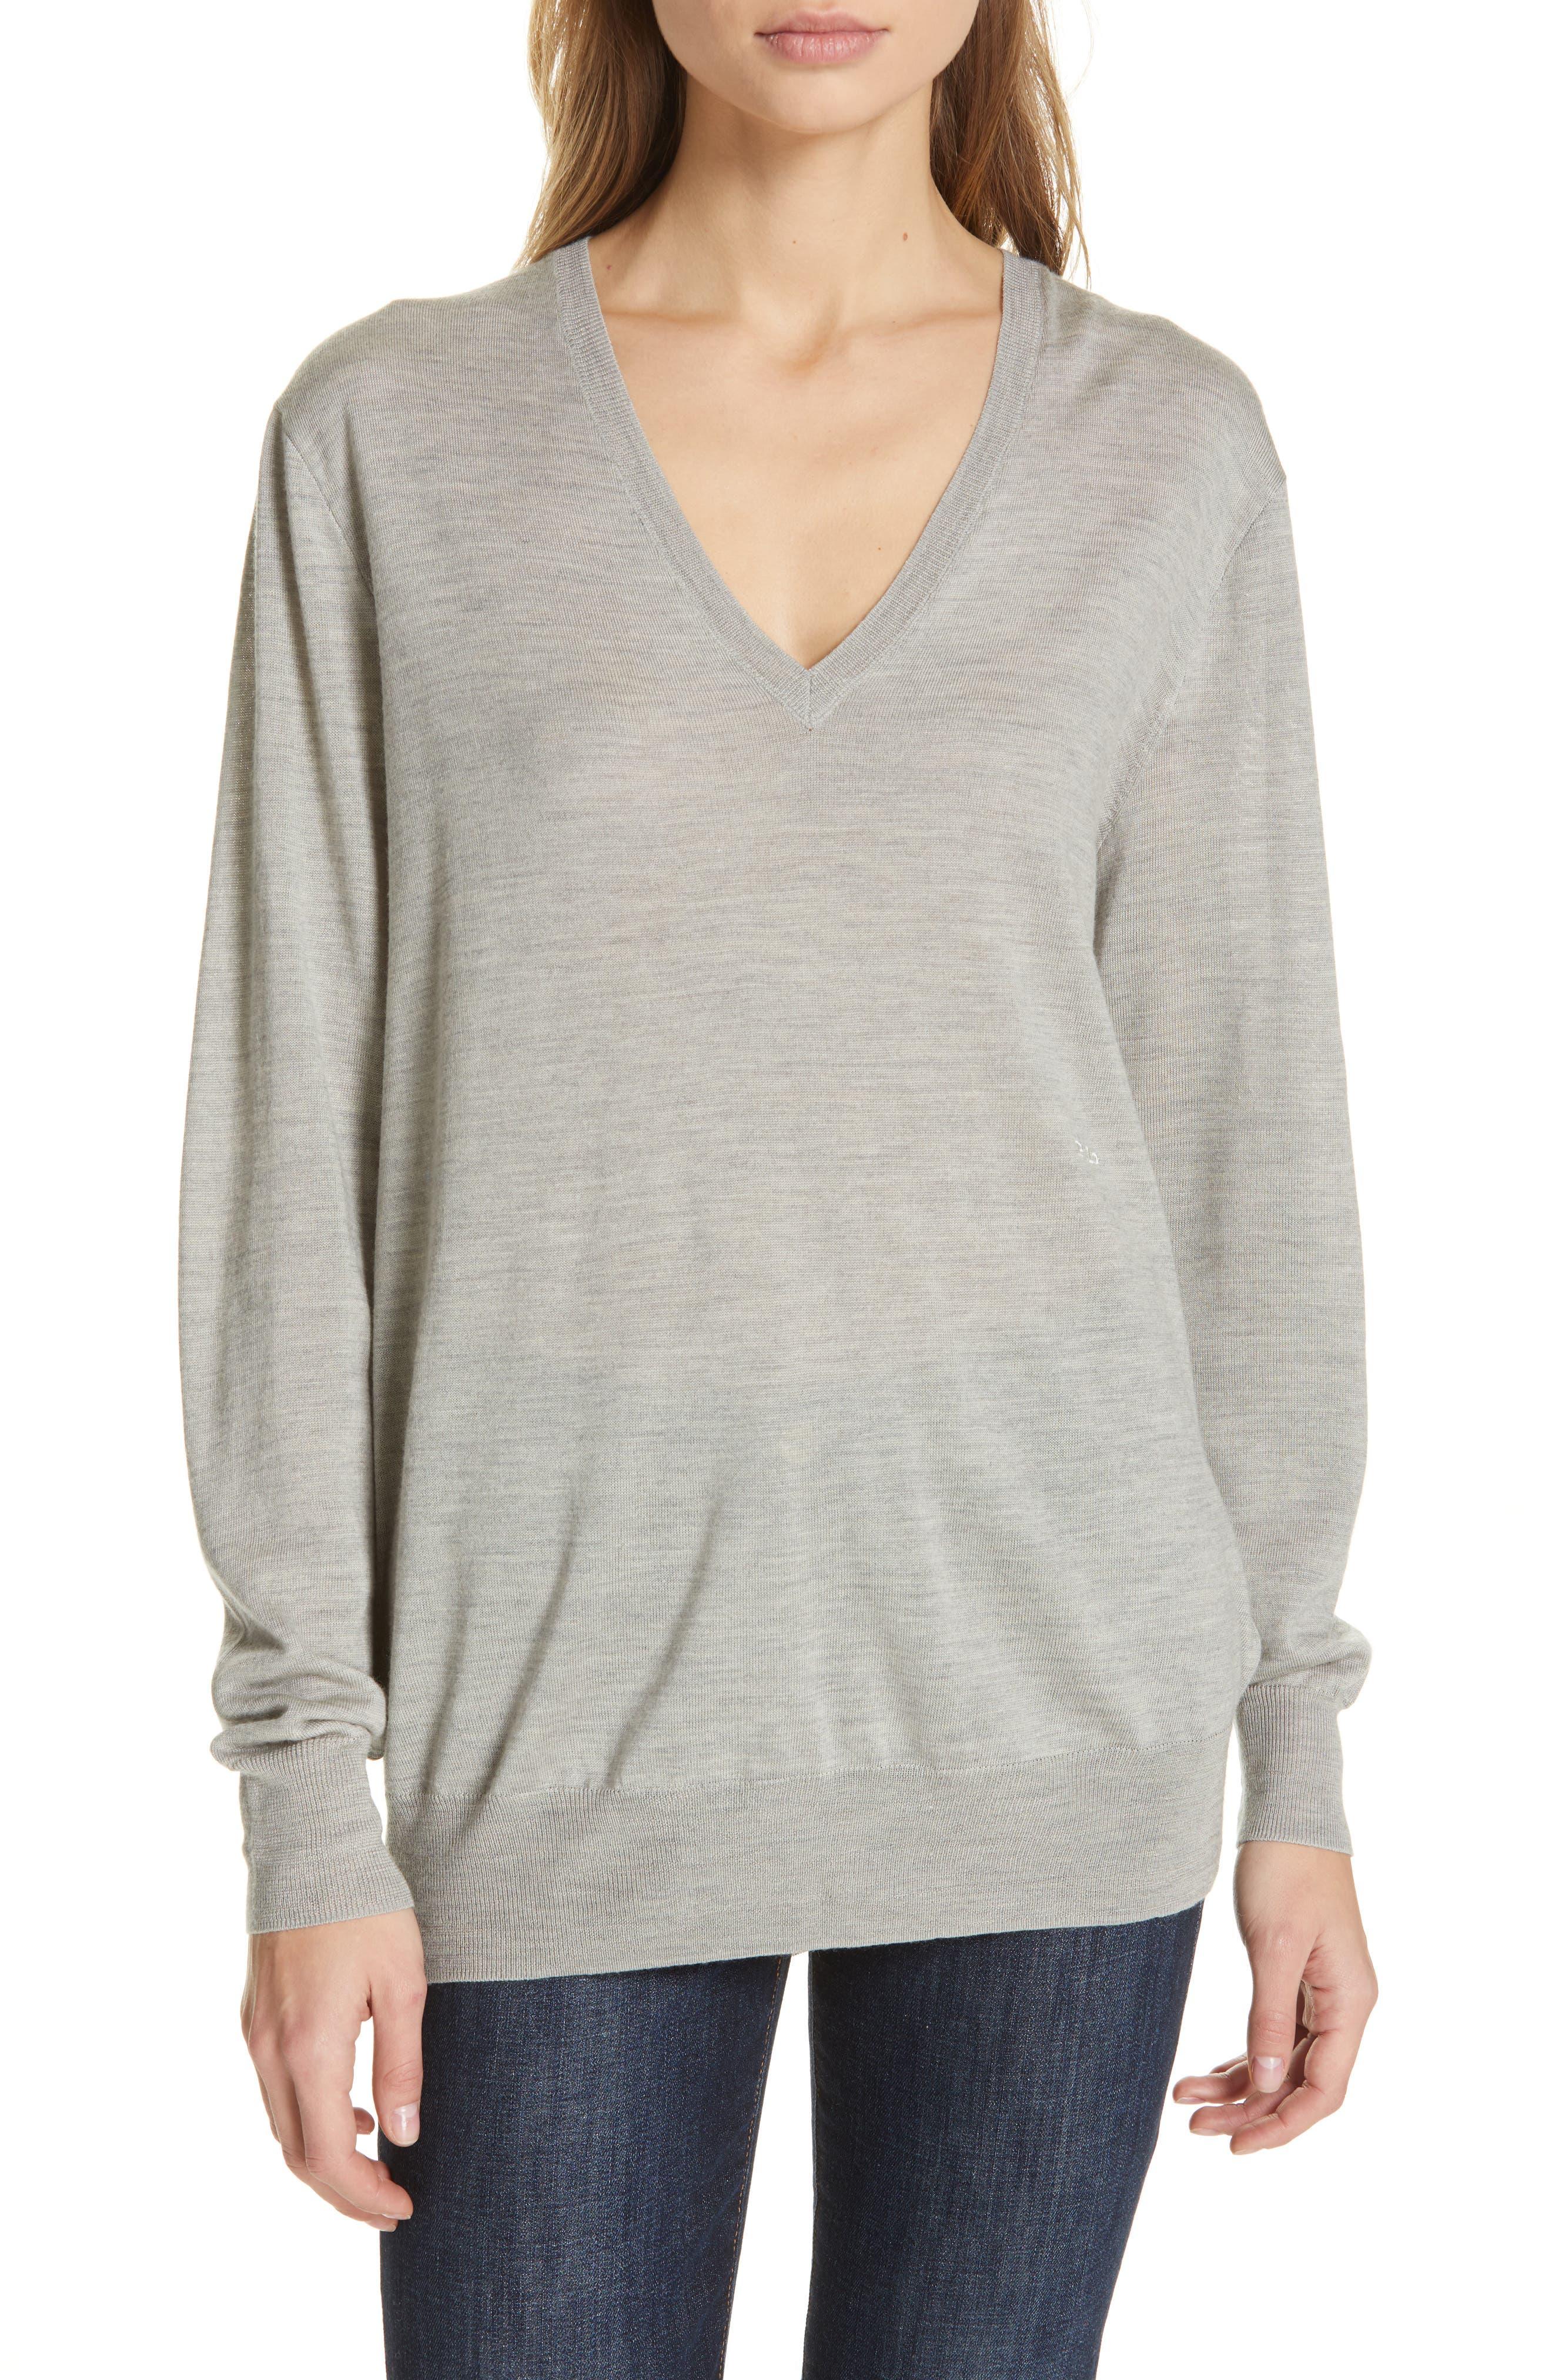 POLO RALPH LAUREN V-Neck Wool, Silk & Cashmere Sweater, Main, color, LIGHT VINTAGE HEATHER